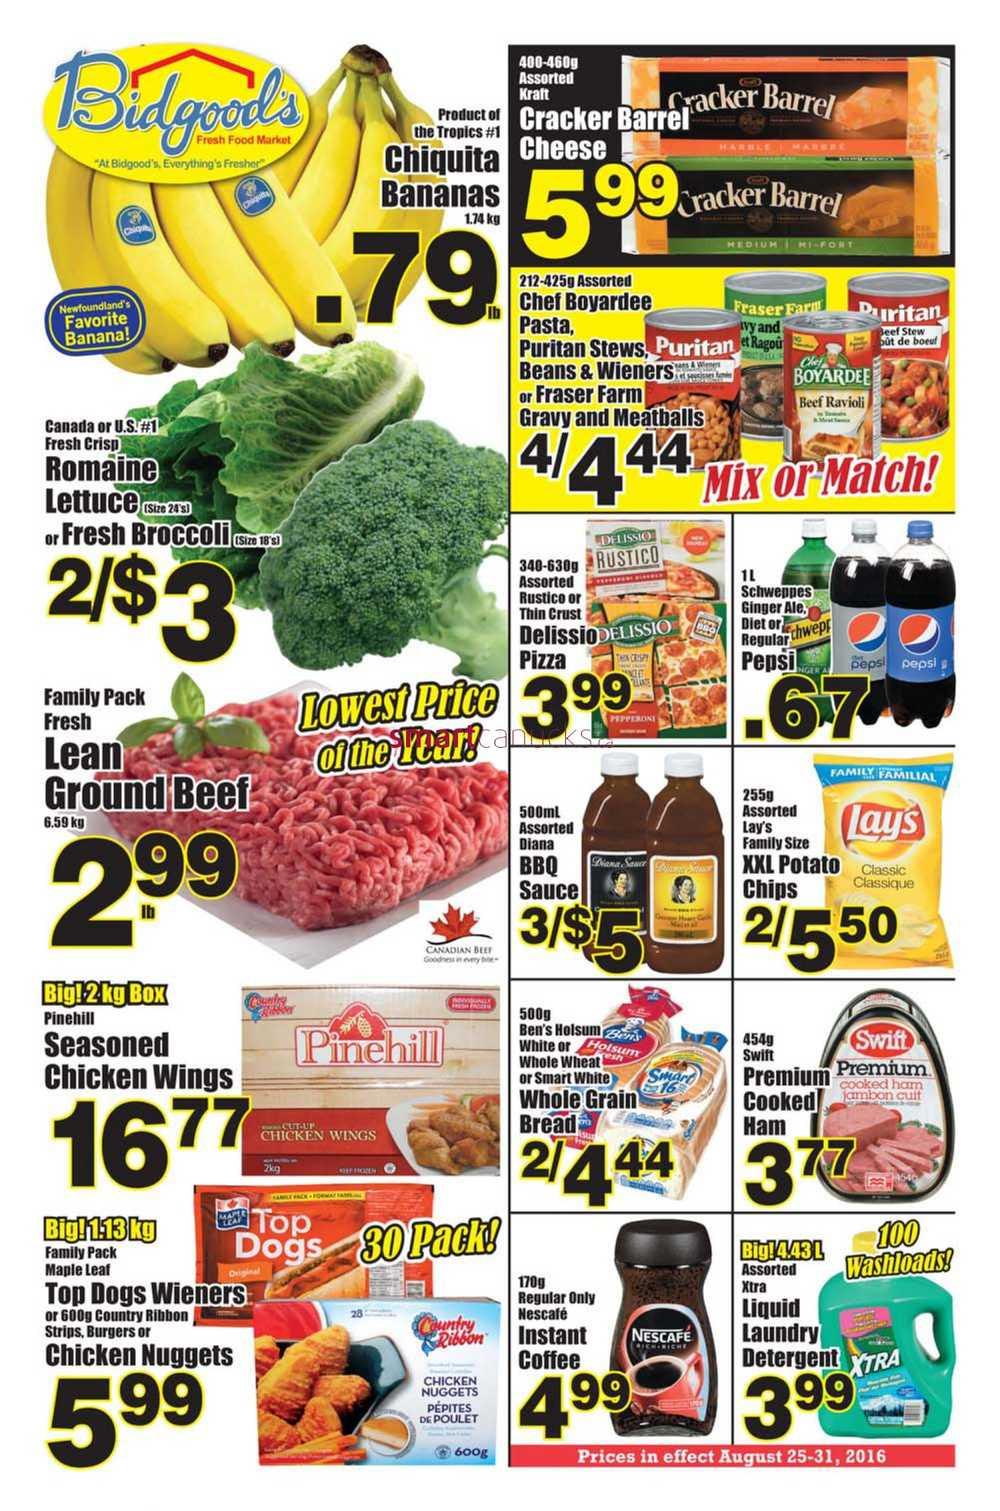 Bidgood Fresh Food Market